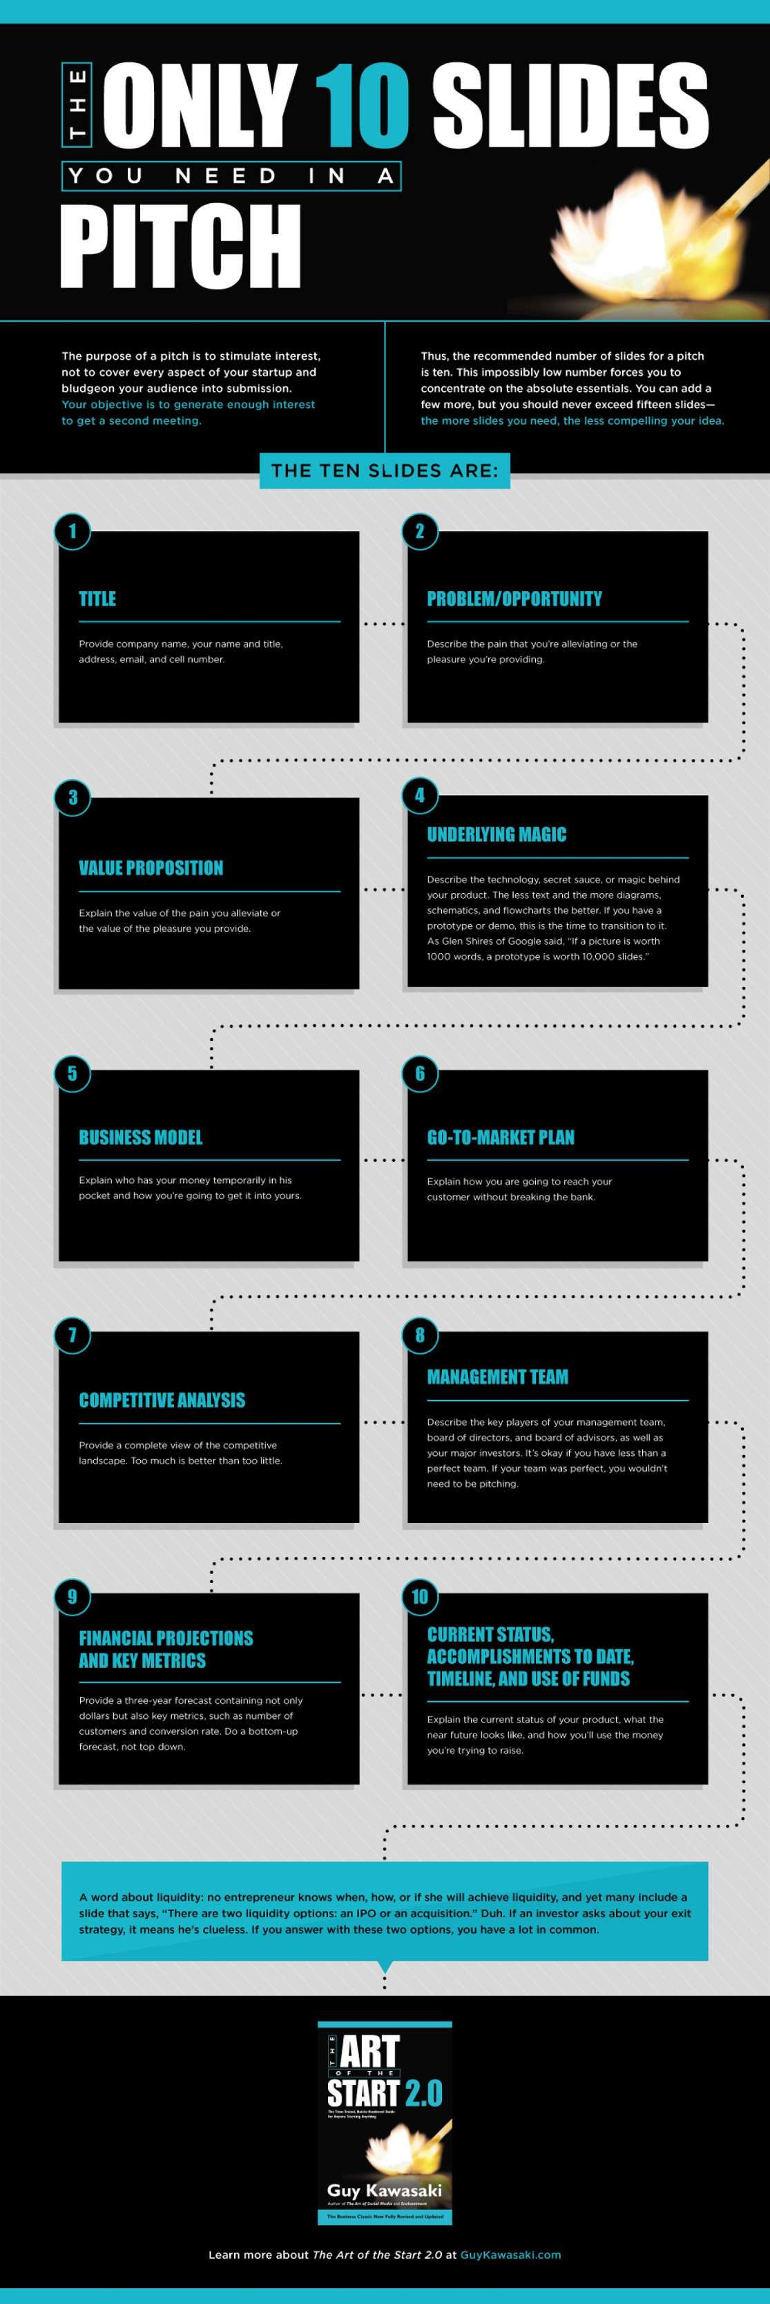 Only 10 Slides! Die Infografik zu Guy Kawasakis Konzept